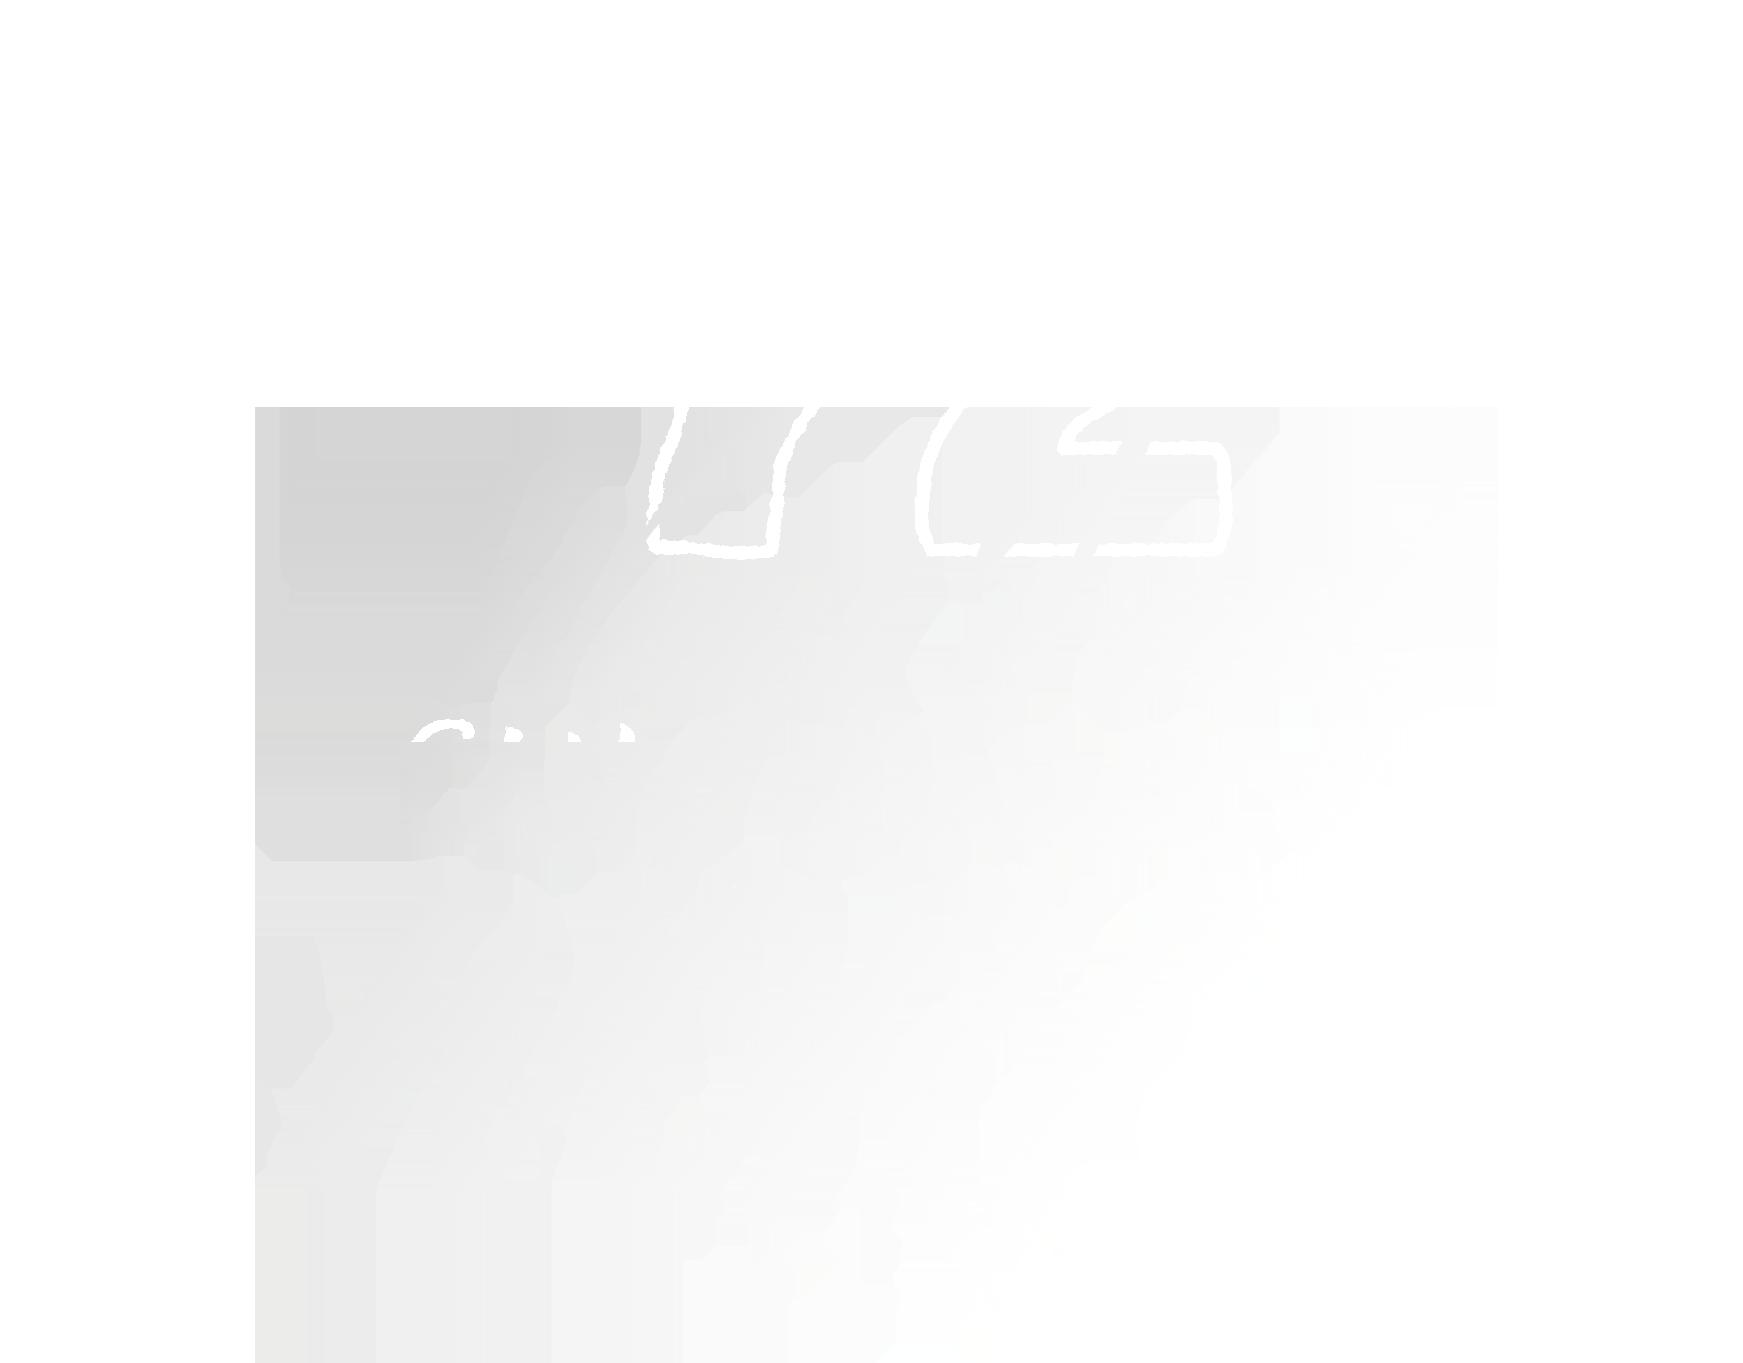 Eater World Changers